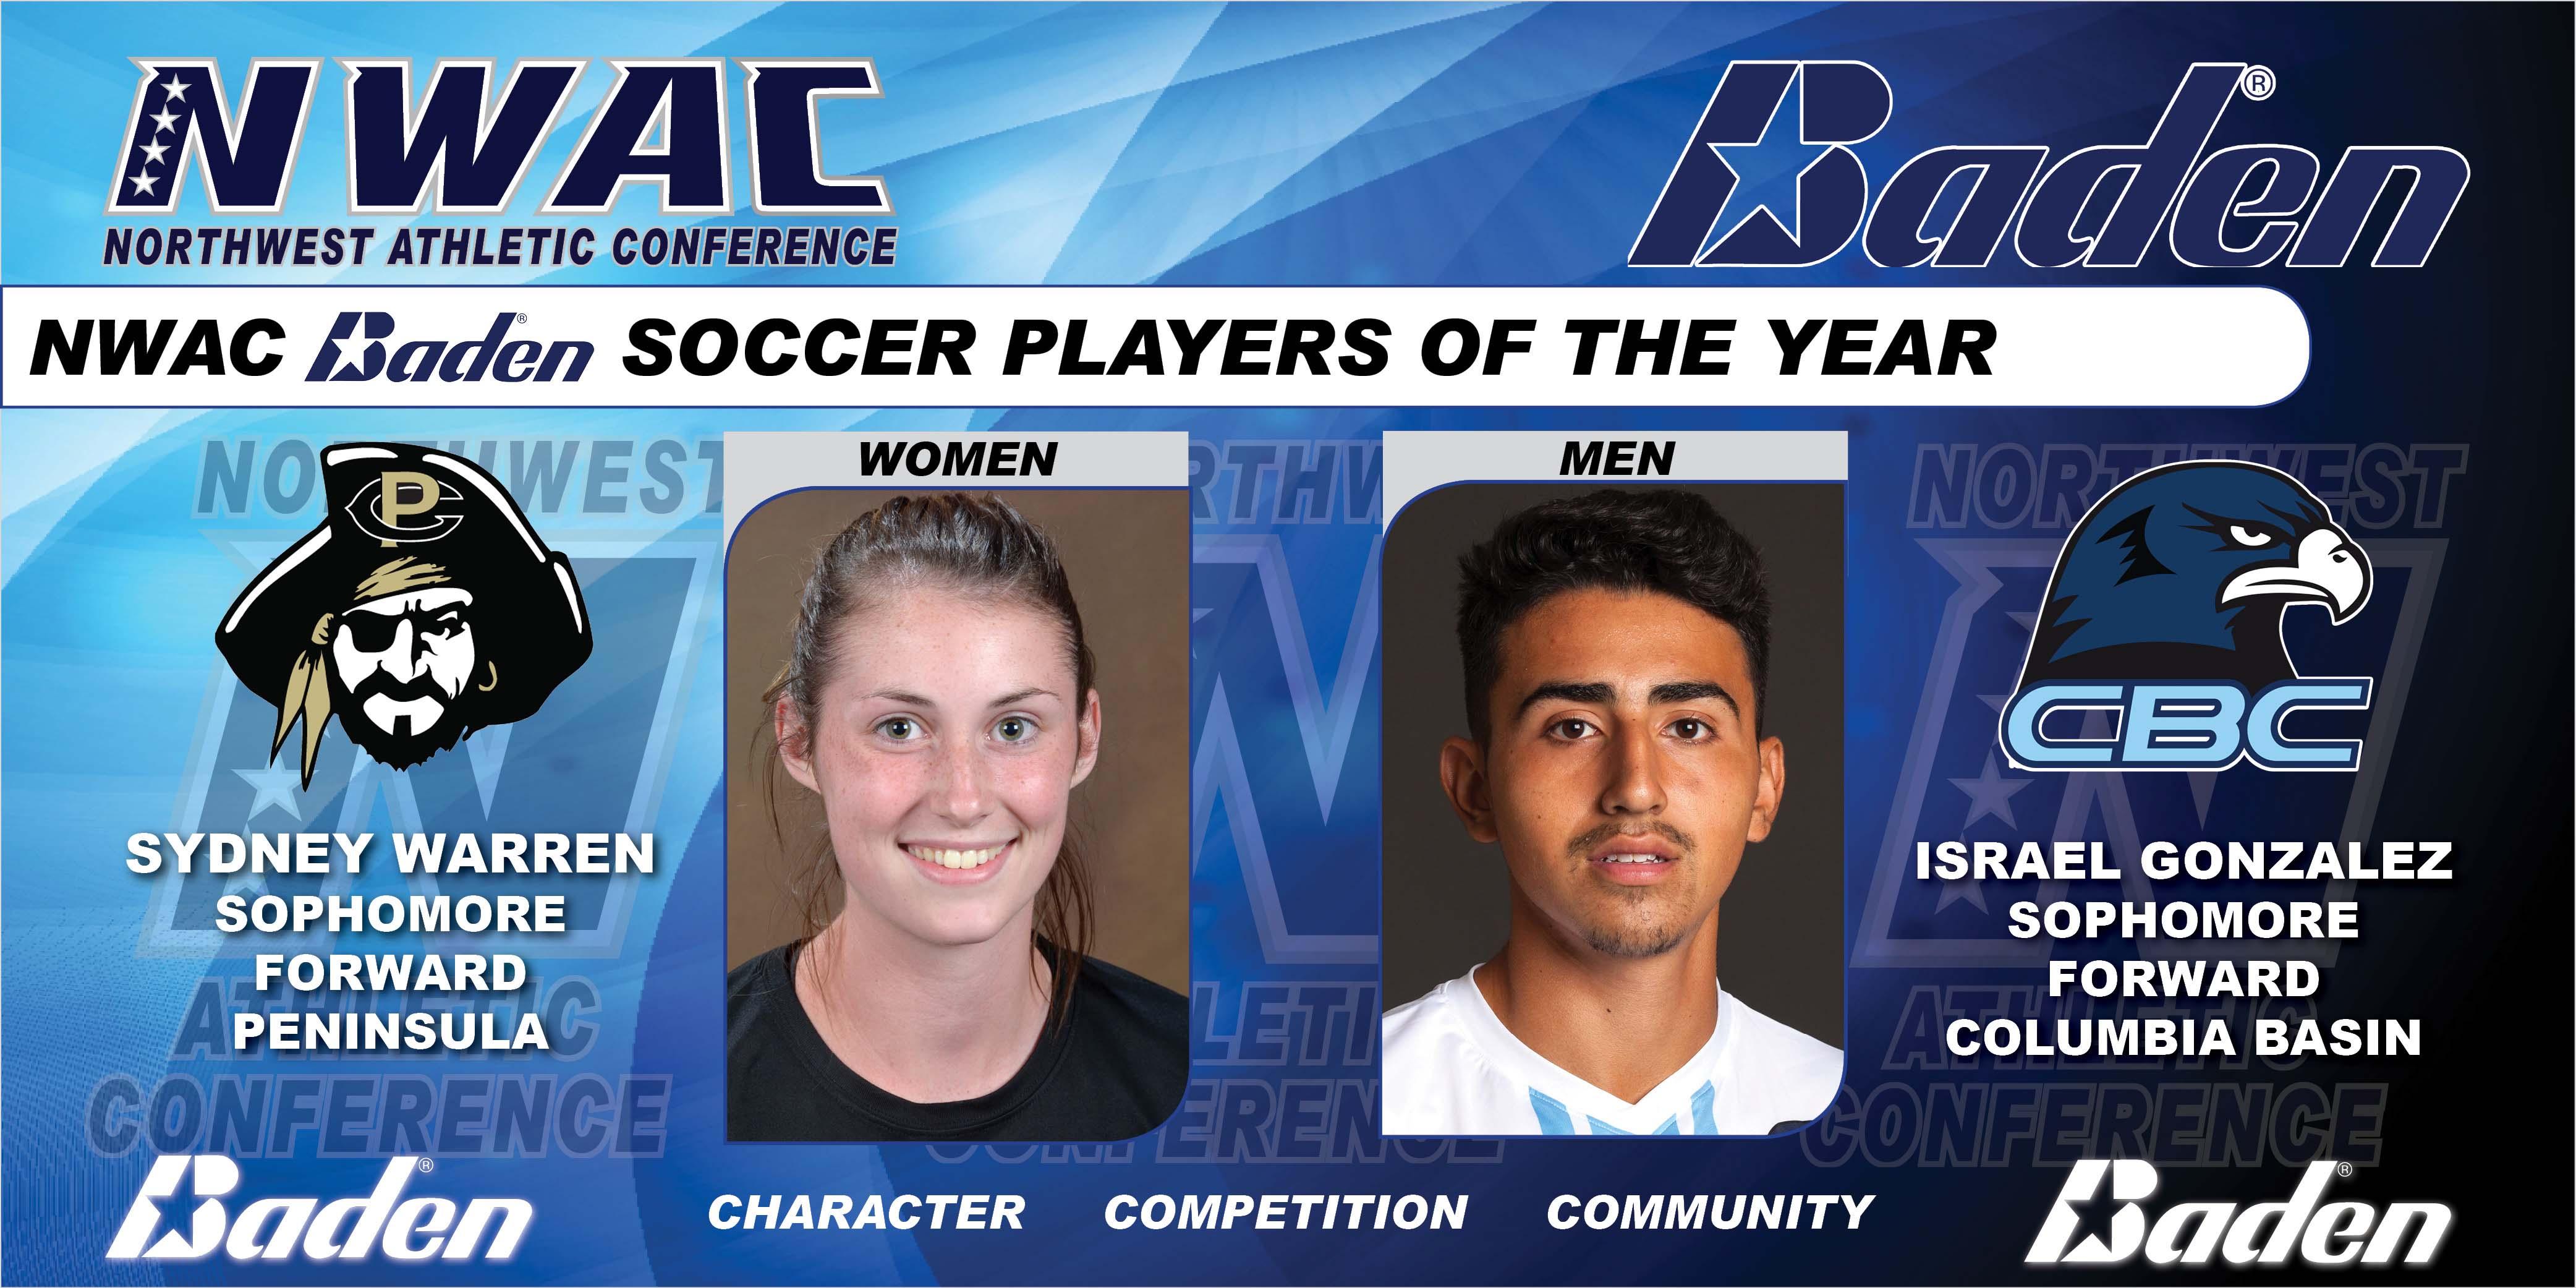 Sydney Warren & Israel Gonzalez Baden Soccer Players of the Year Graphic